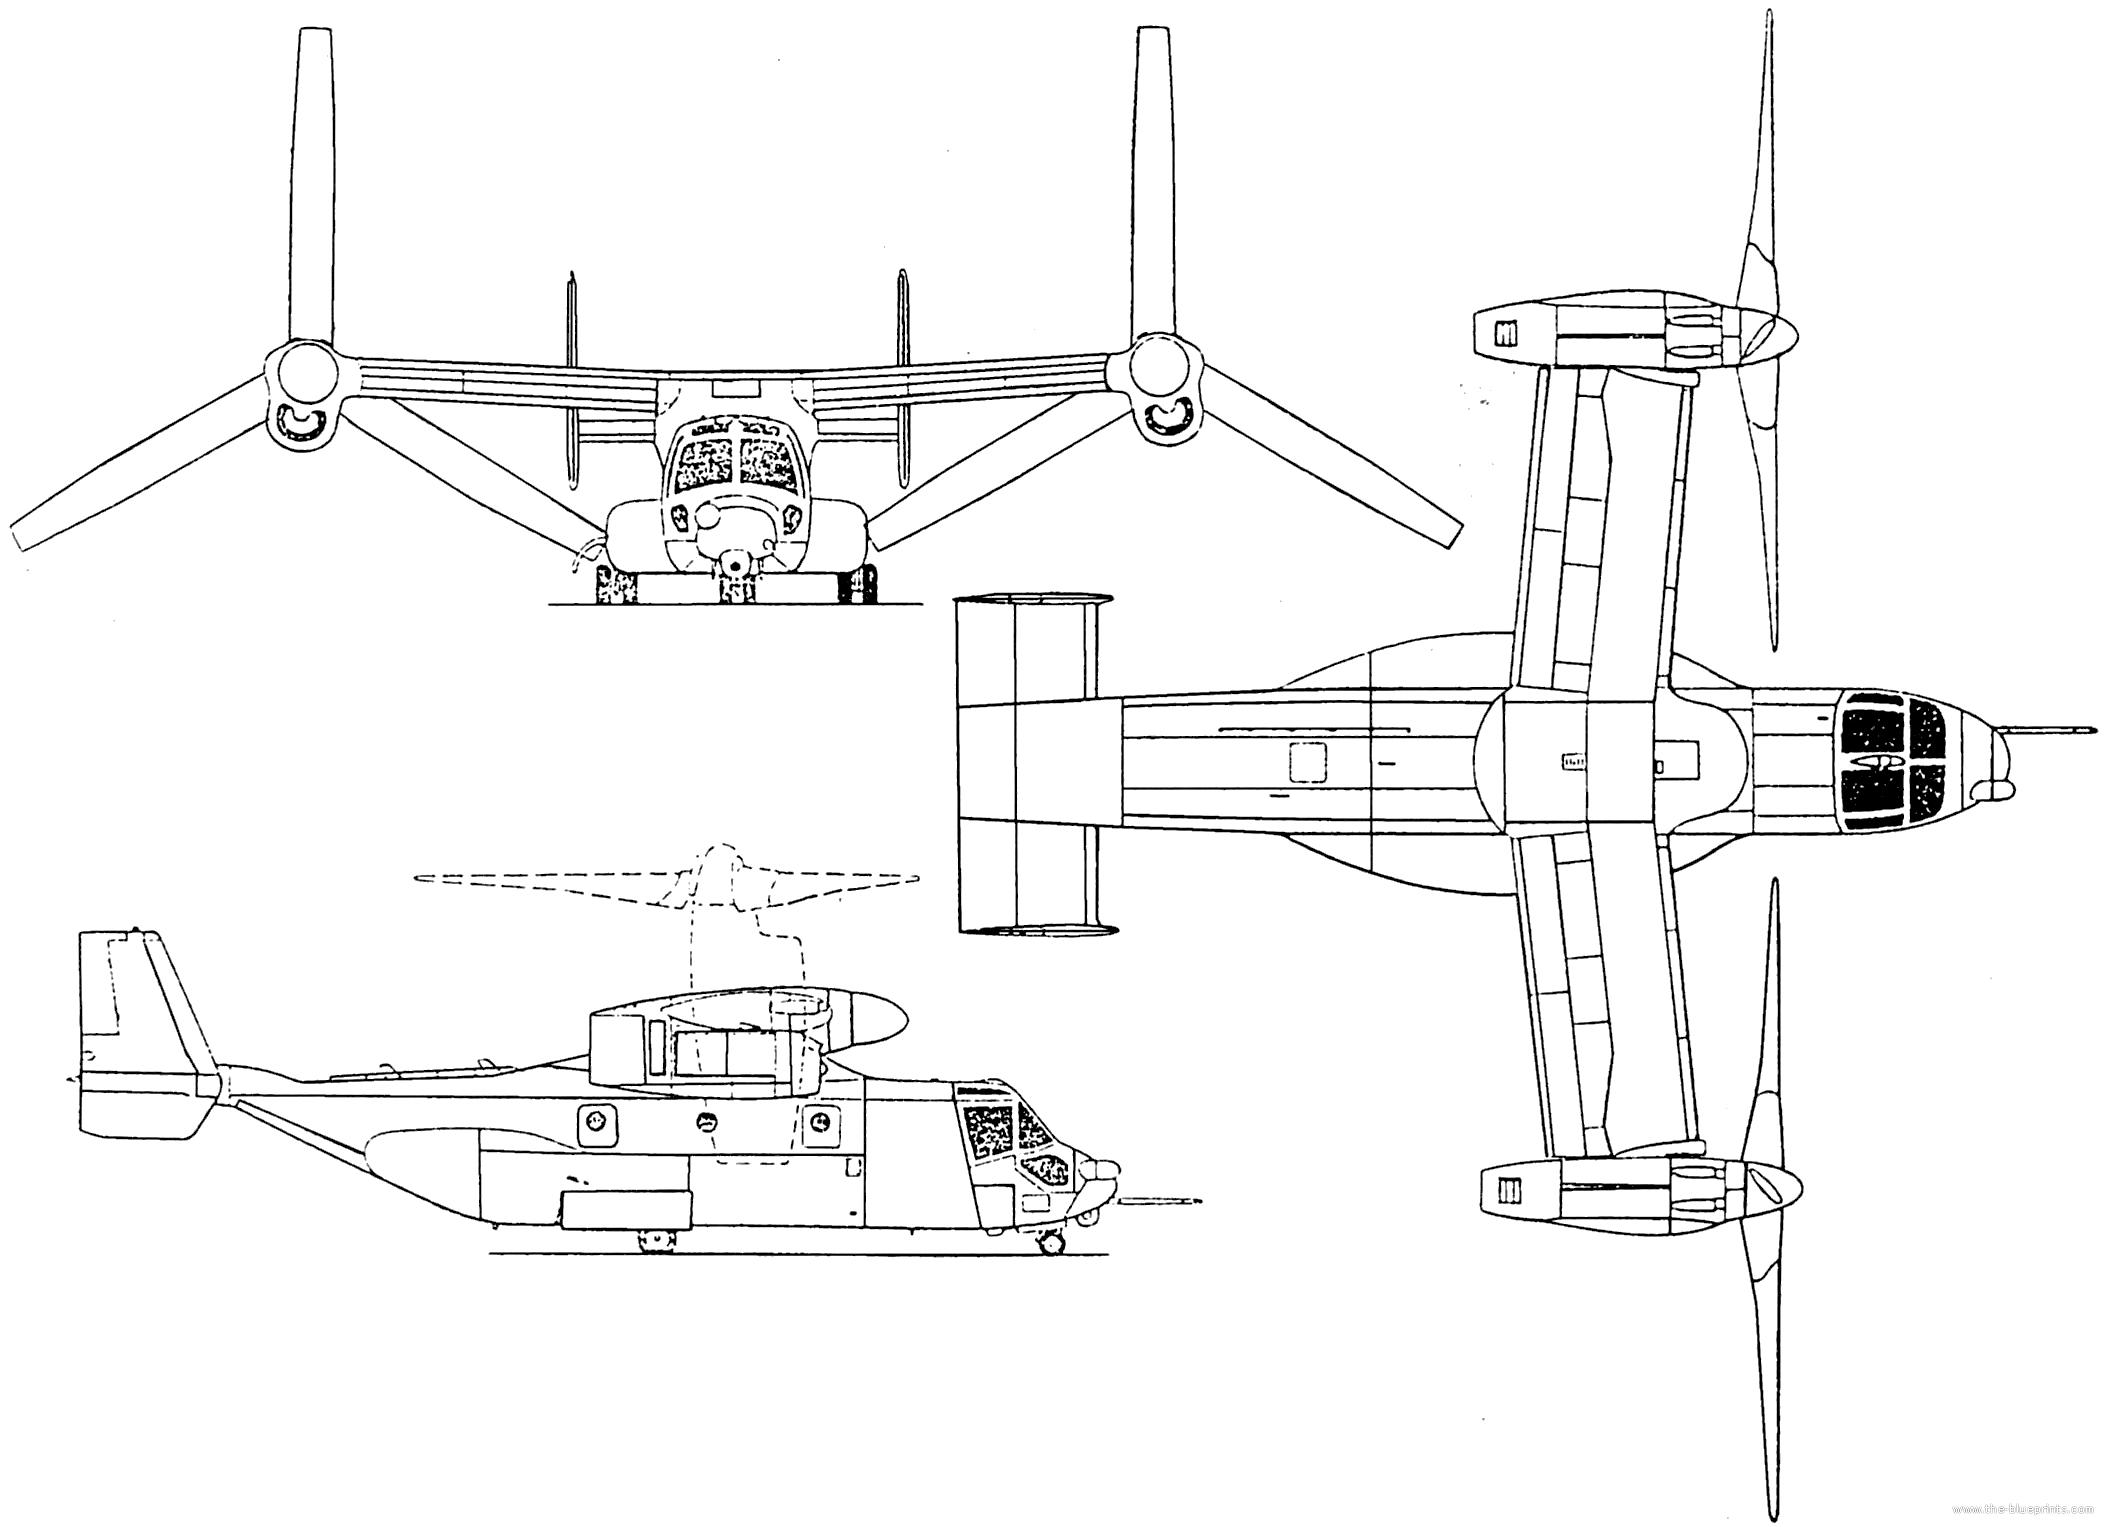 Blueprints > Helicopters > Bell > Bell Boeing V-22 Osprey